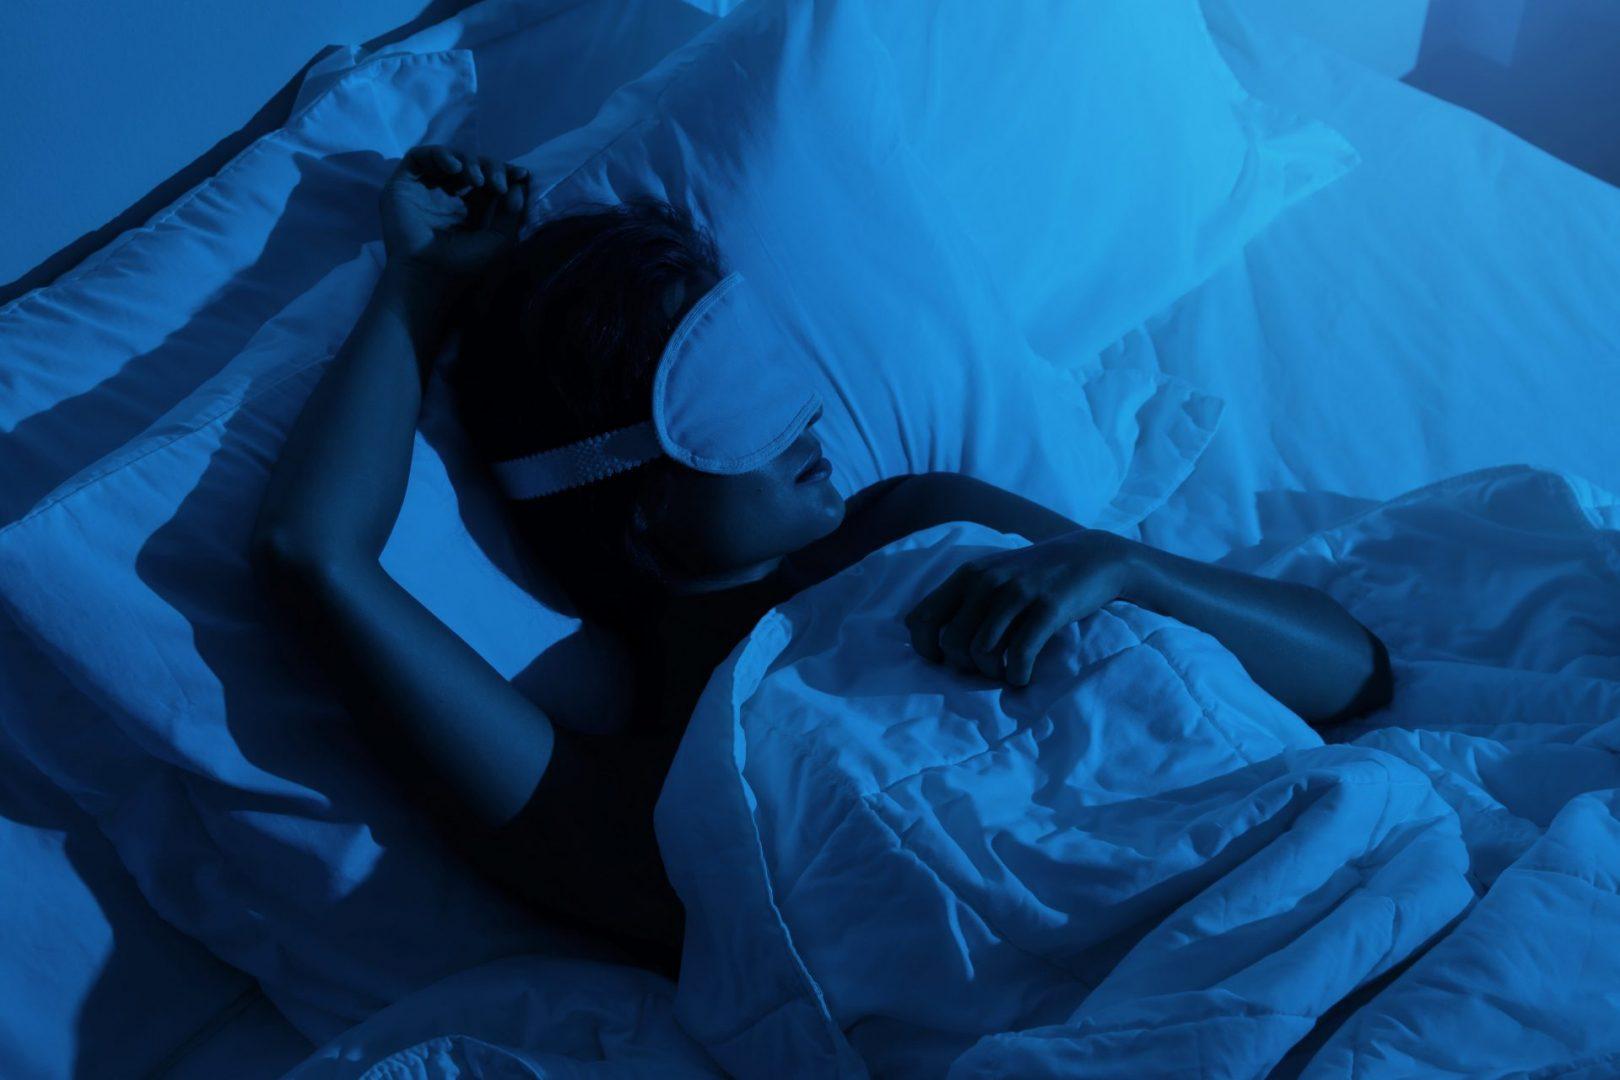 REM Sleep: A deeper look into REM